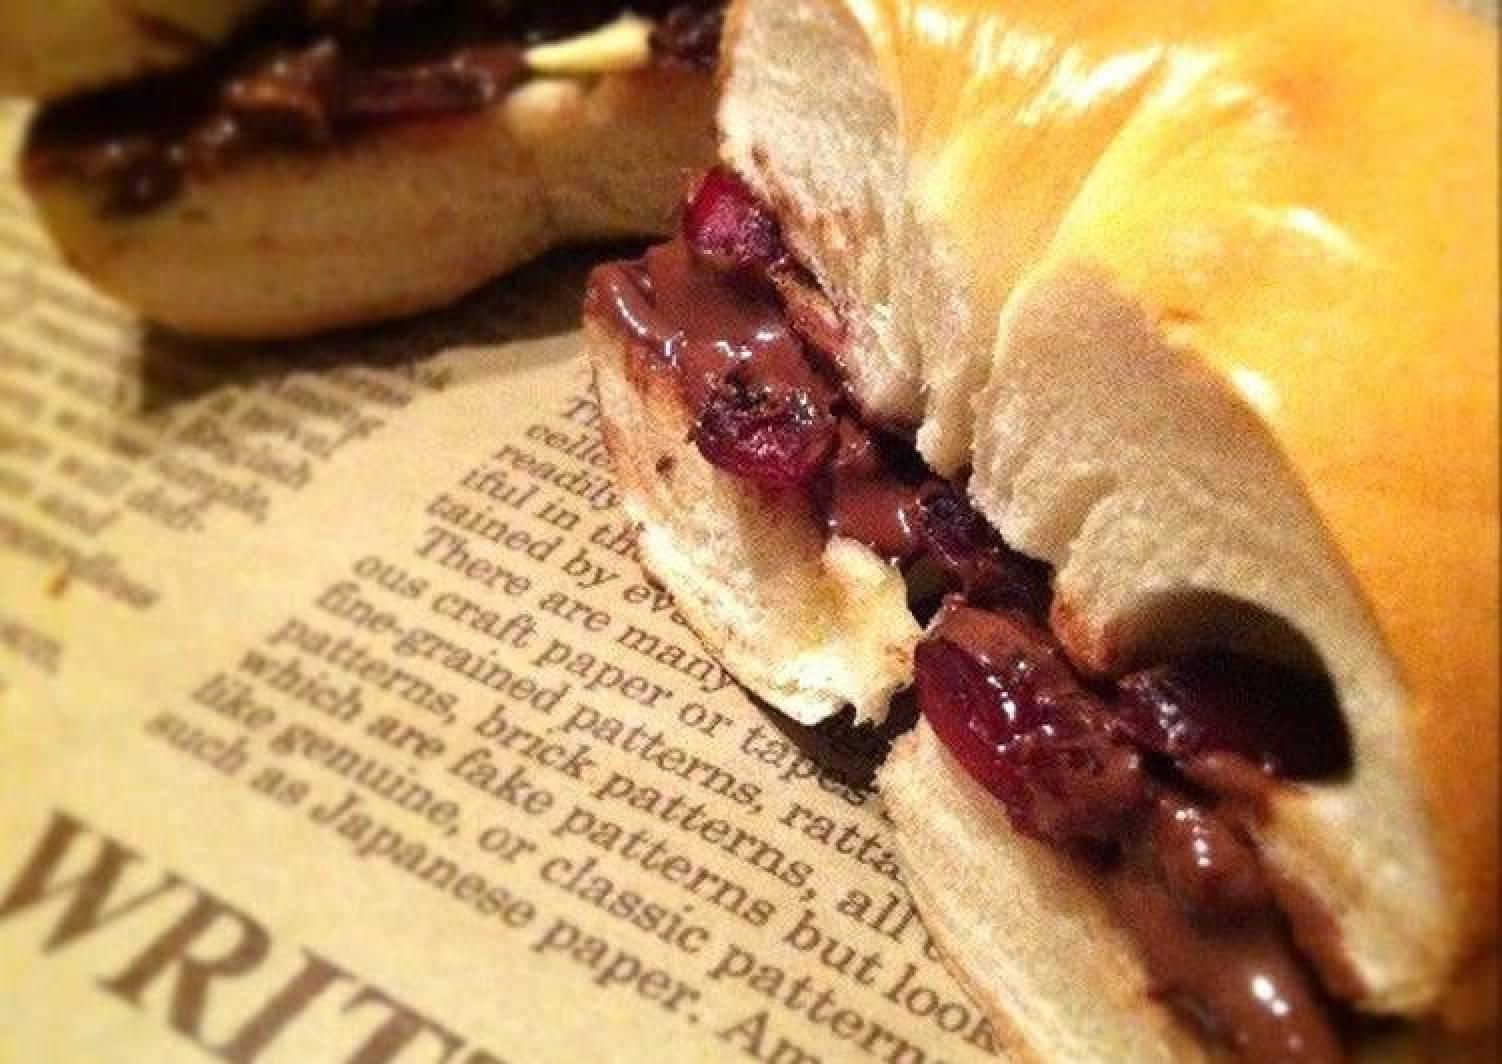 Berry & Chocolate Bagel Sandwich